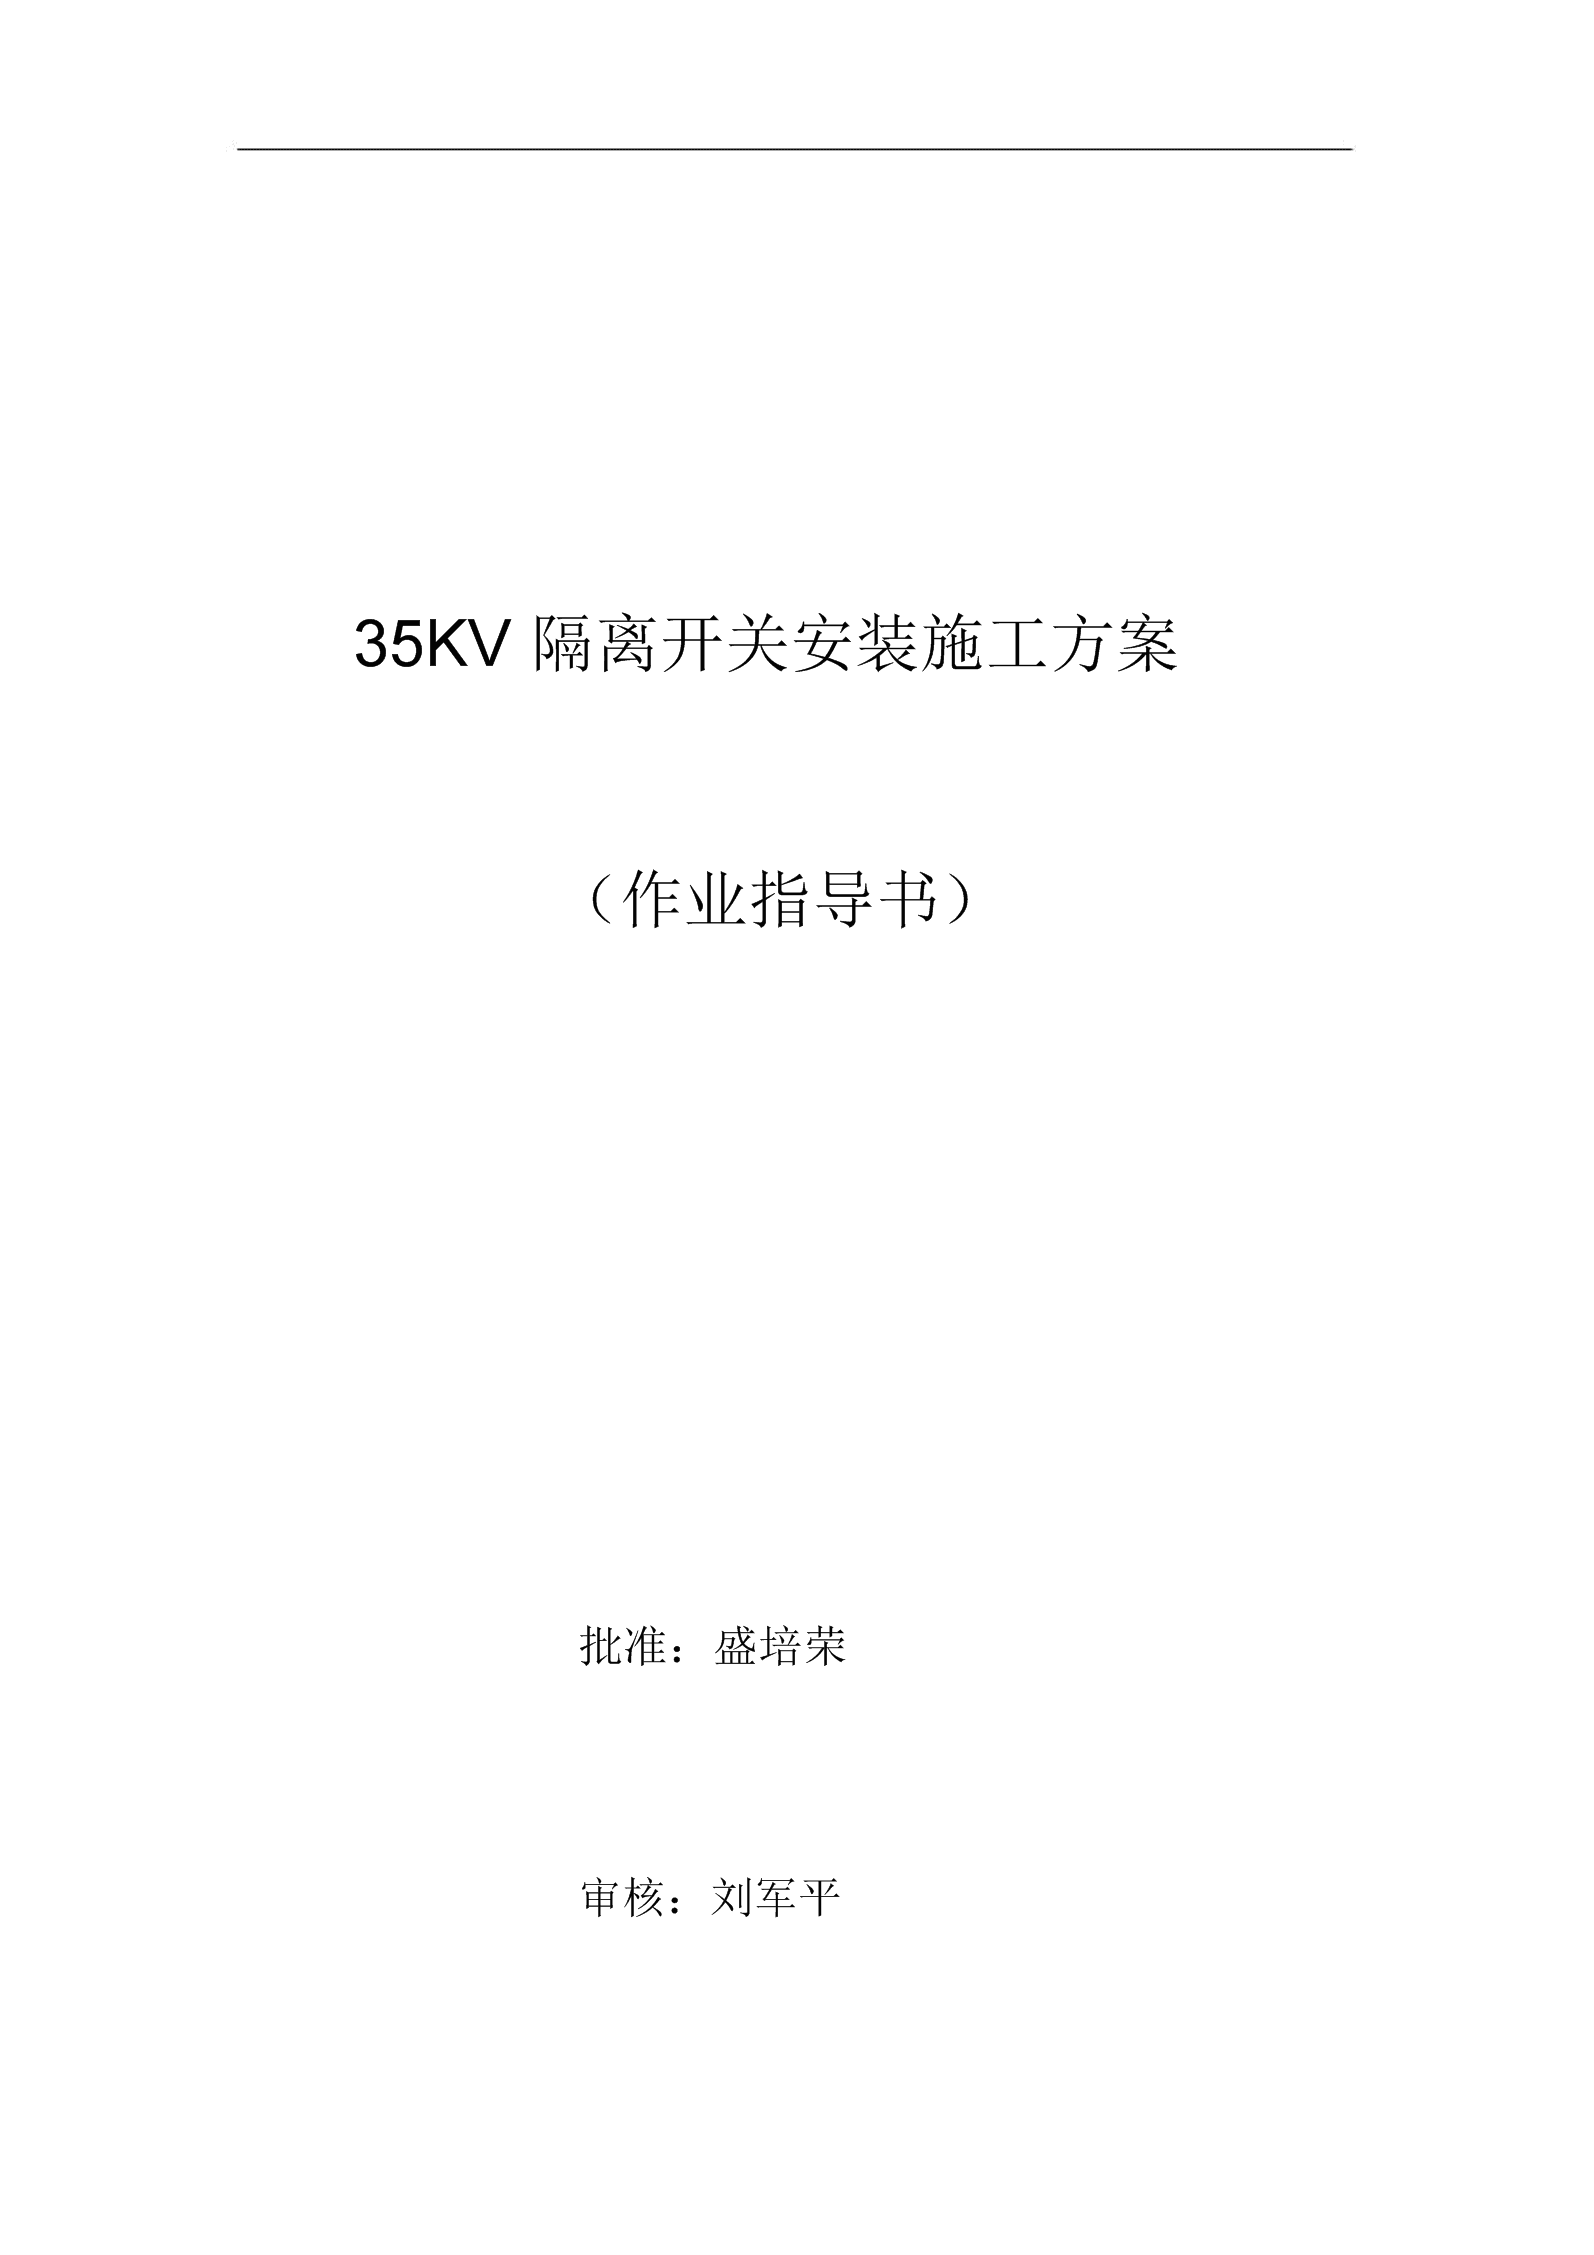 35KV隔离开关安装施工组织规划设计实施方案.docx